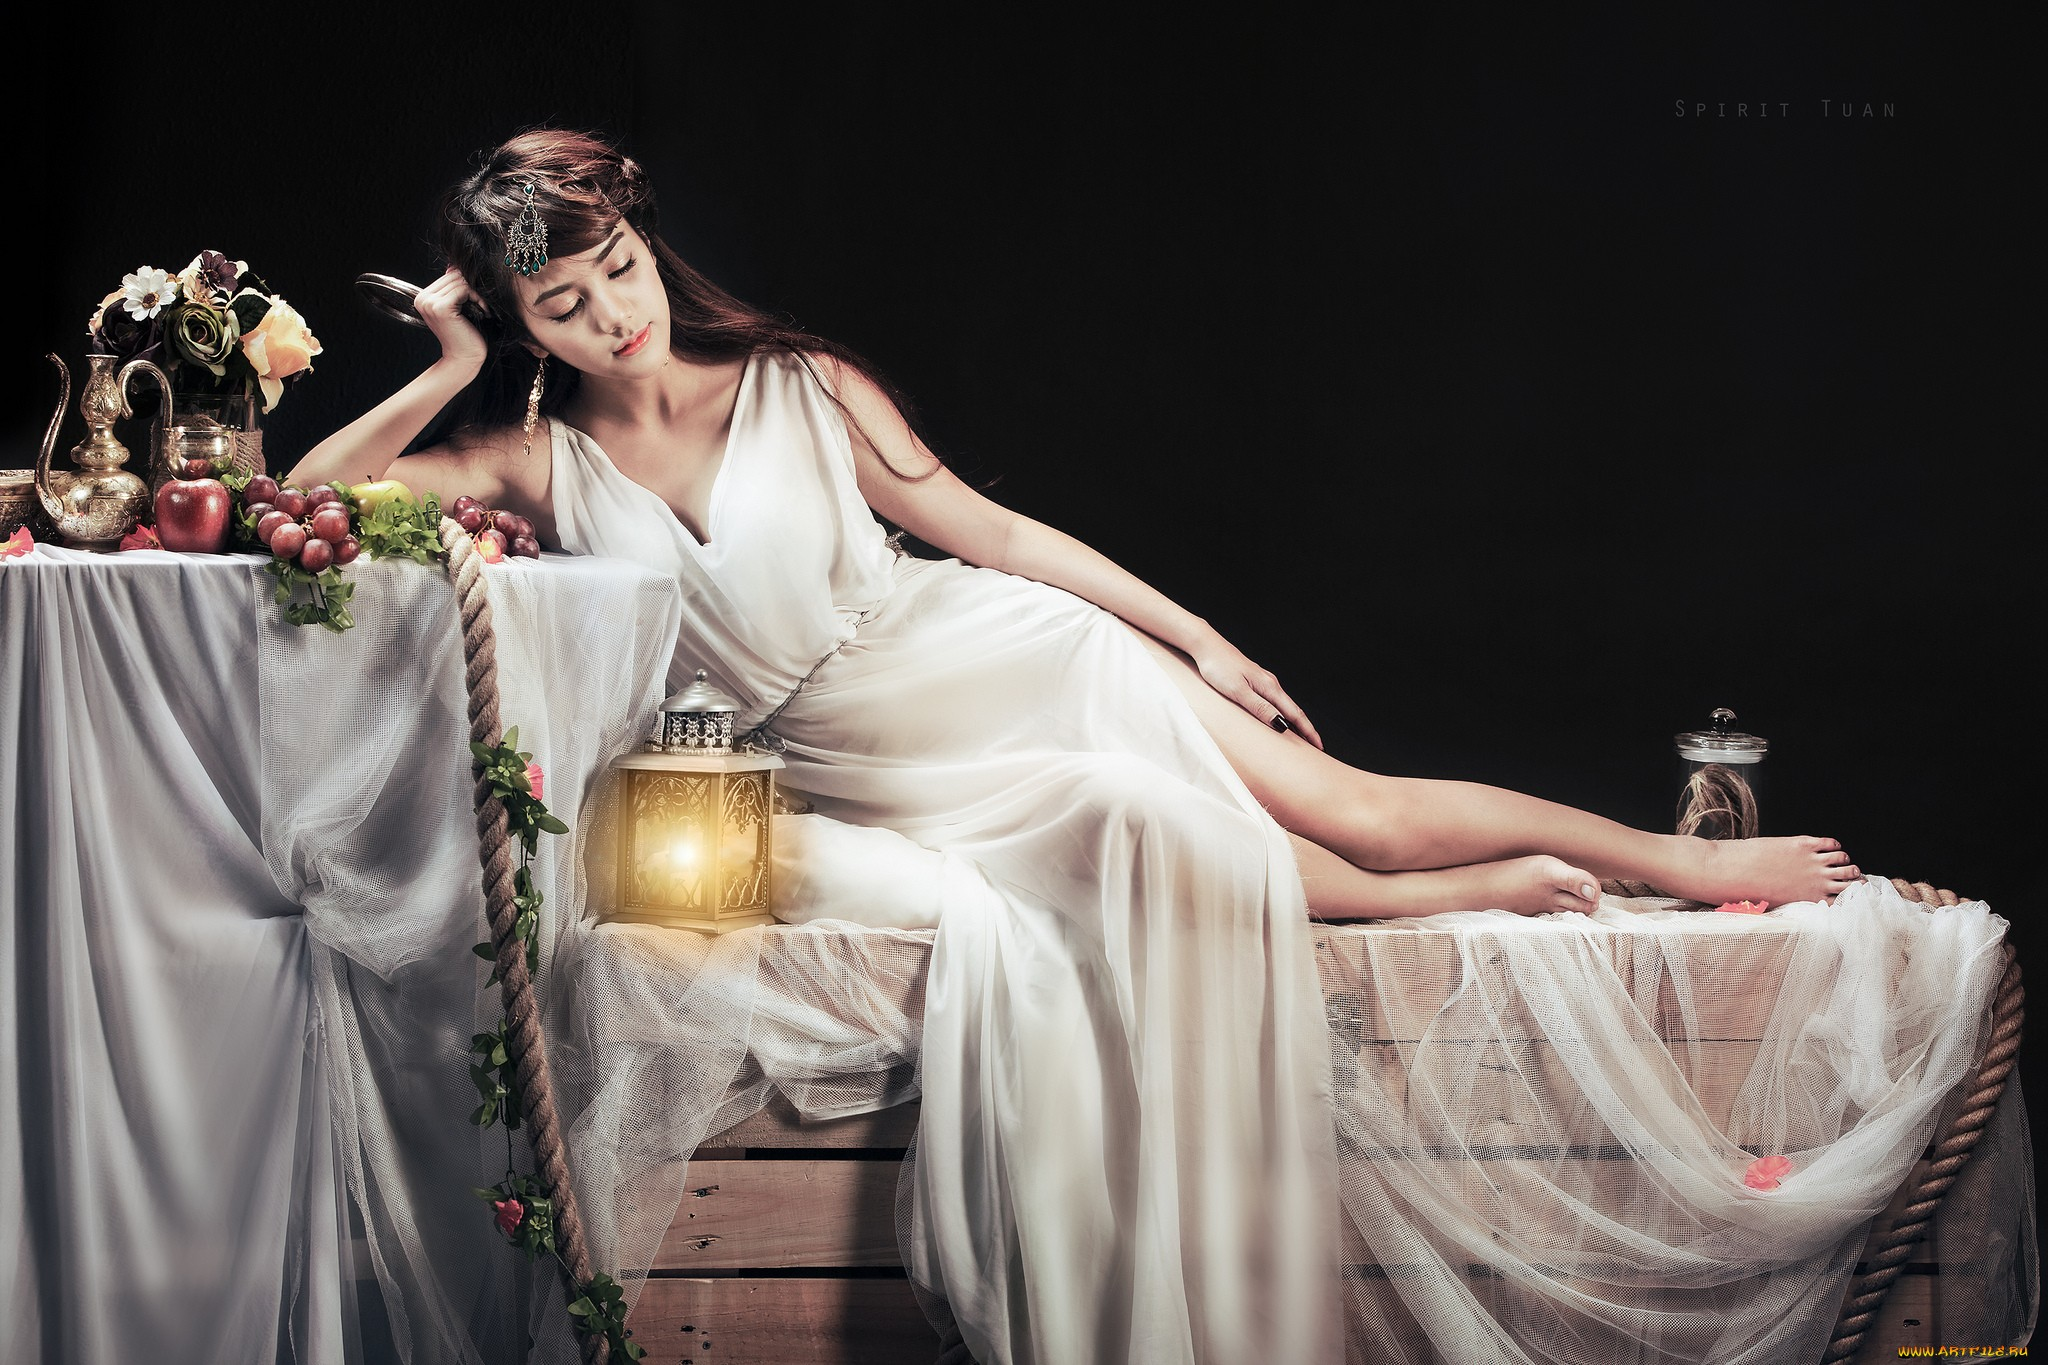 Images of Linh Napie | 2048x1365